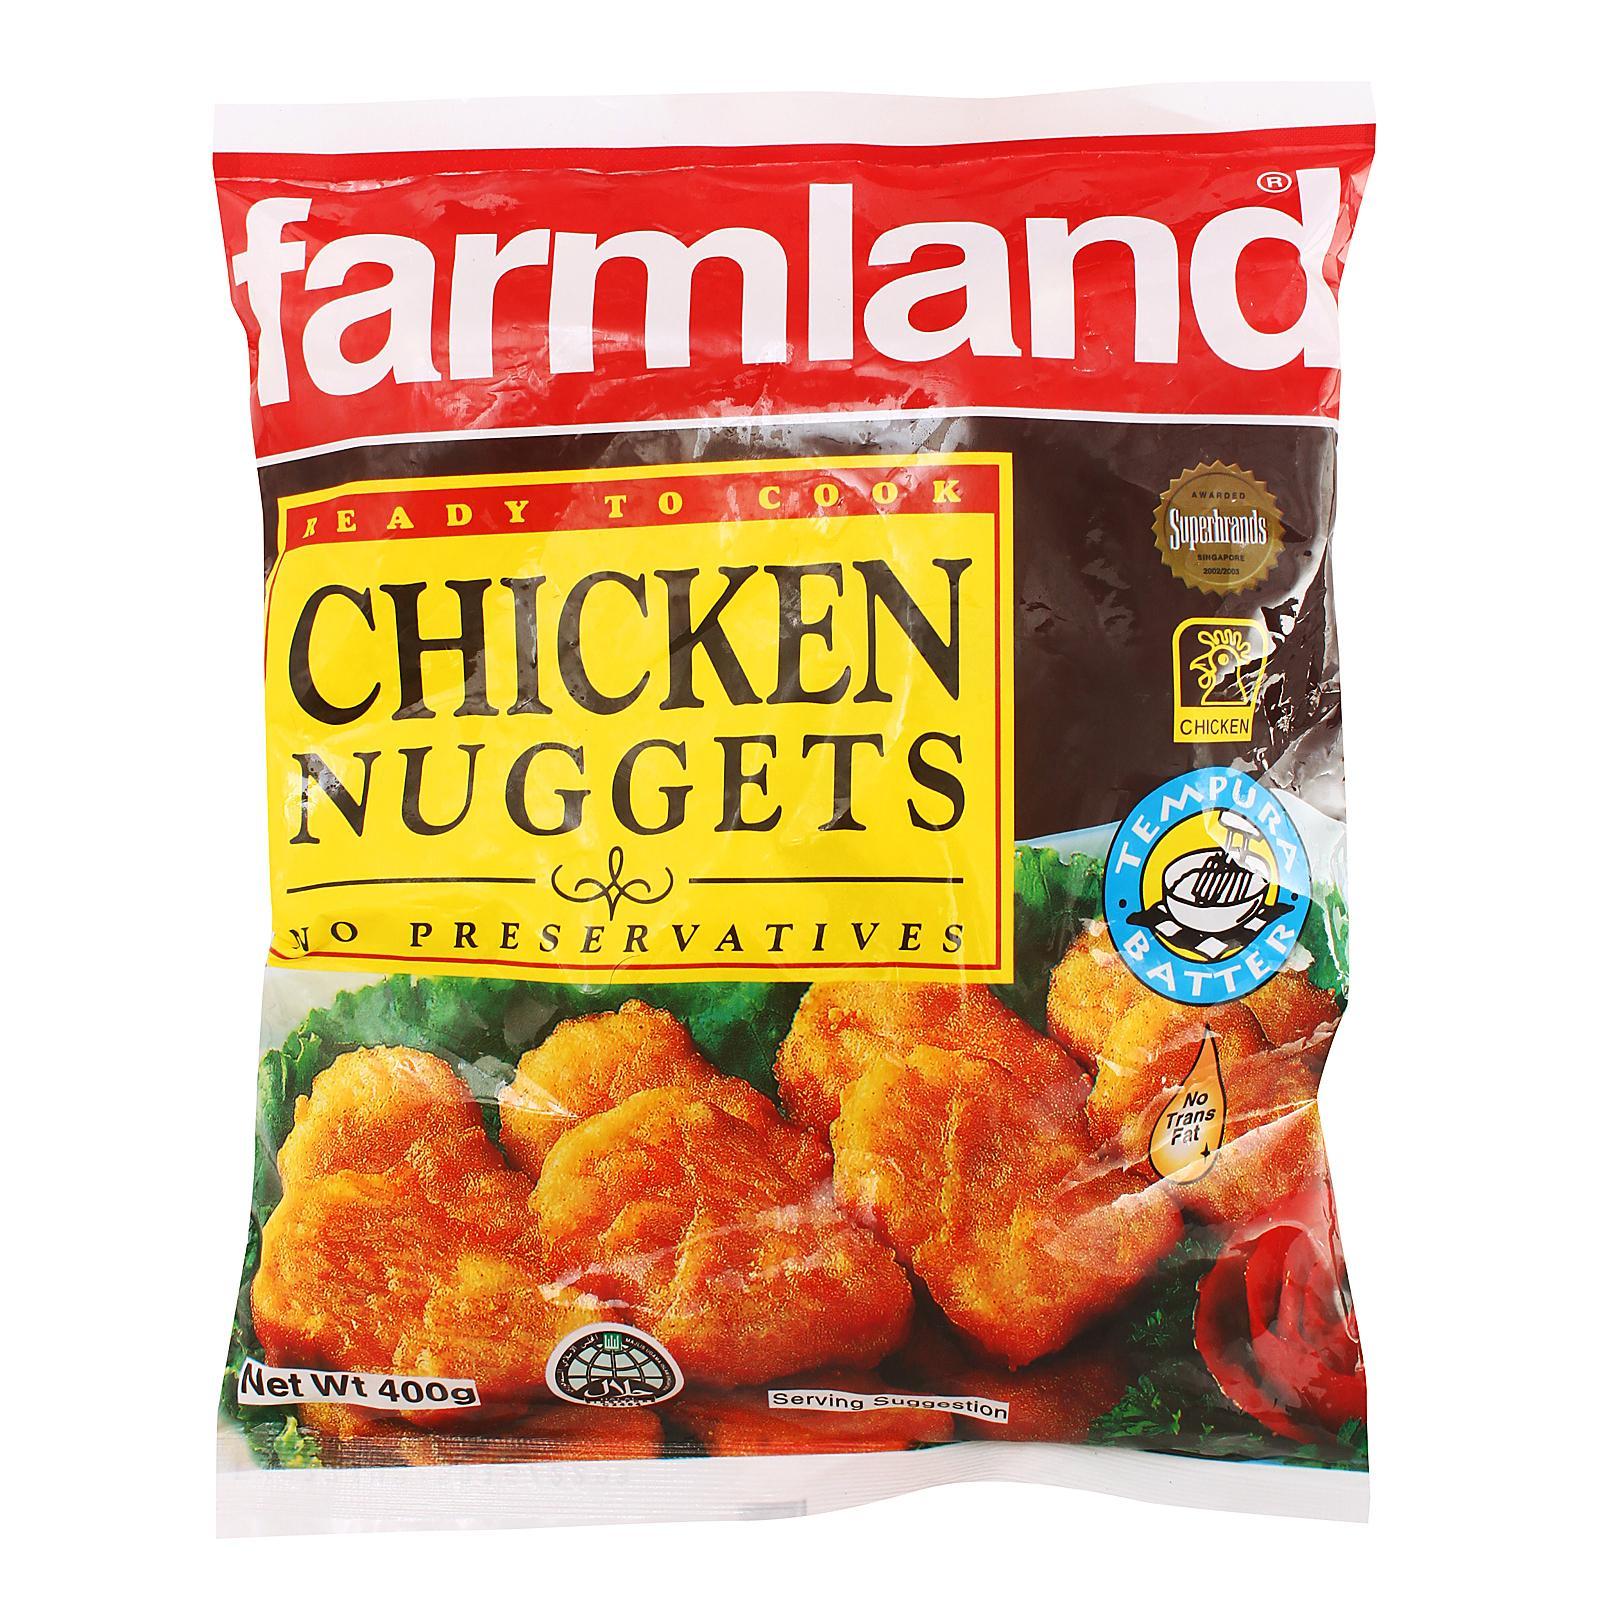 Farmland Original Chicken Nuggets - Frozen